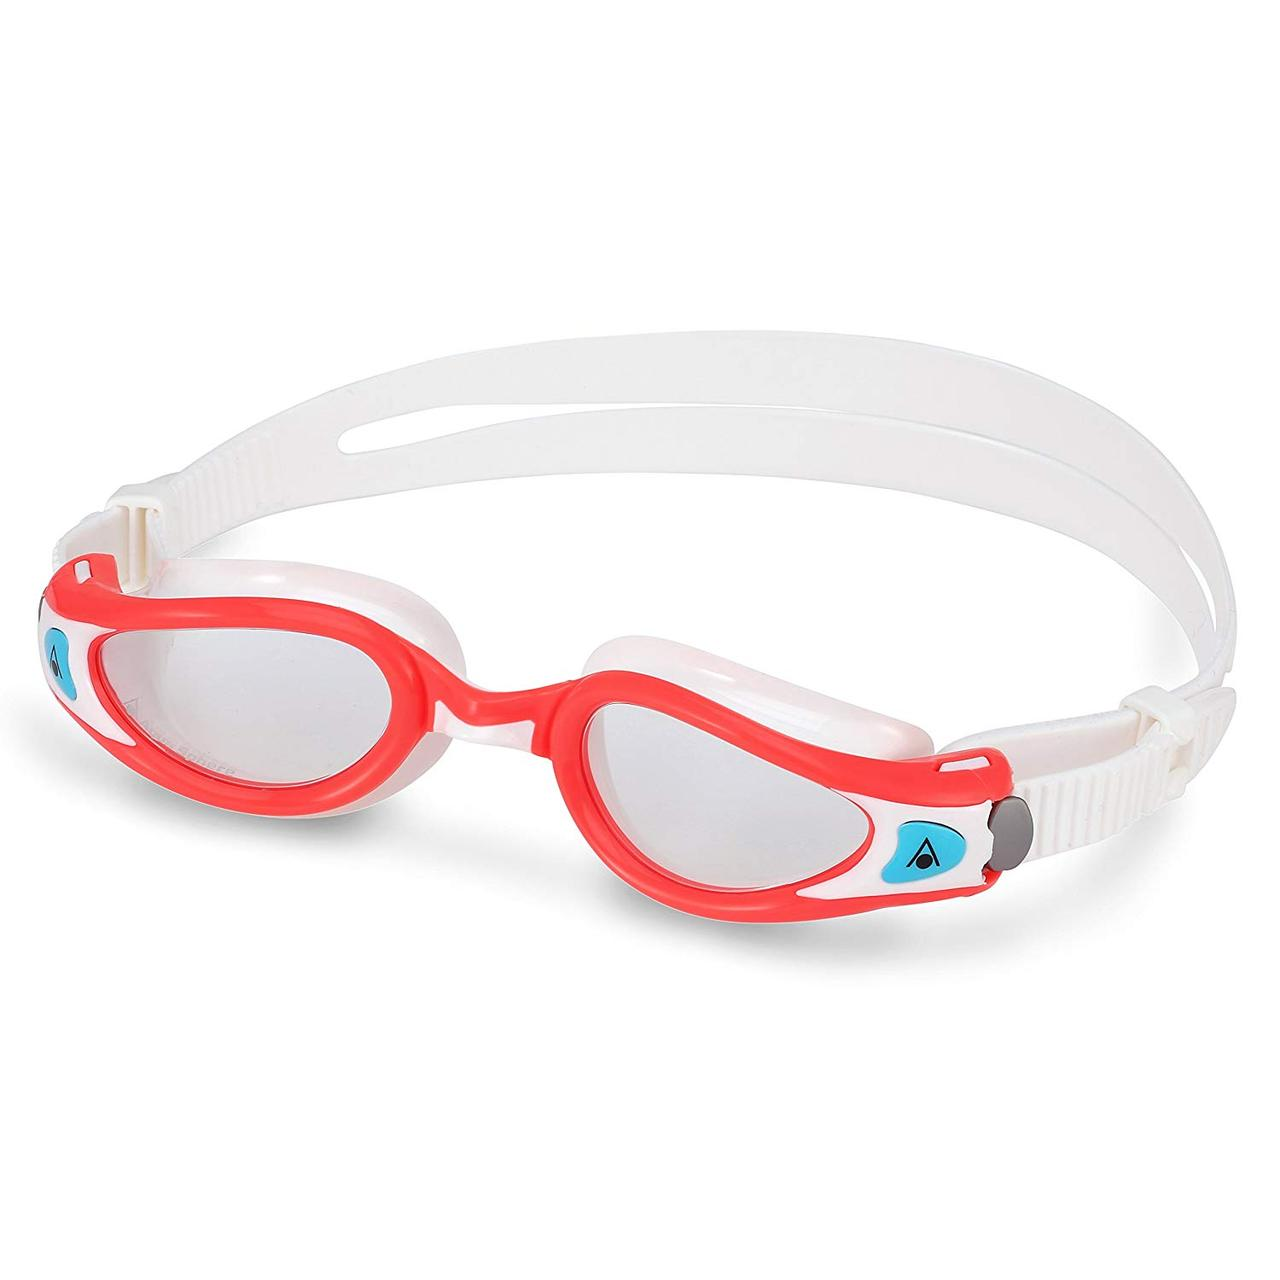 Женские очки для плавания Aqua Sphere Kaiman EXO Ladies (175720) Оригинал